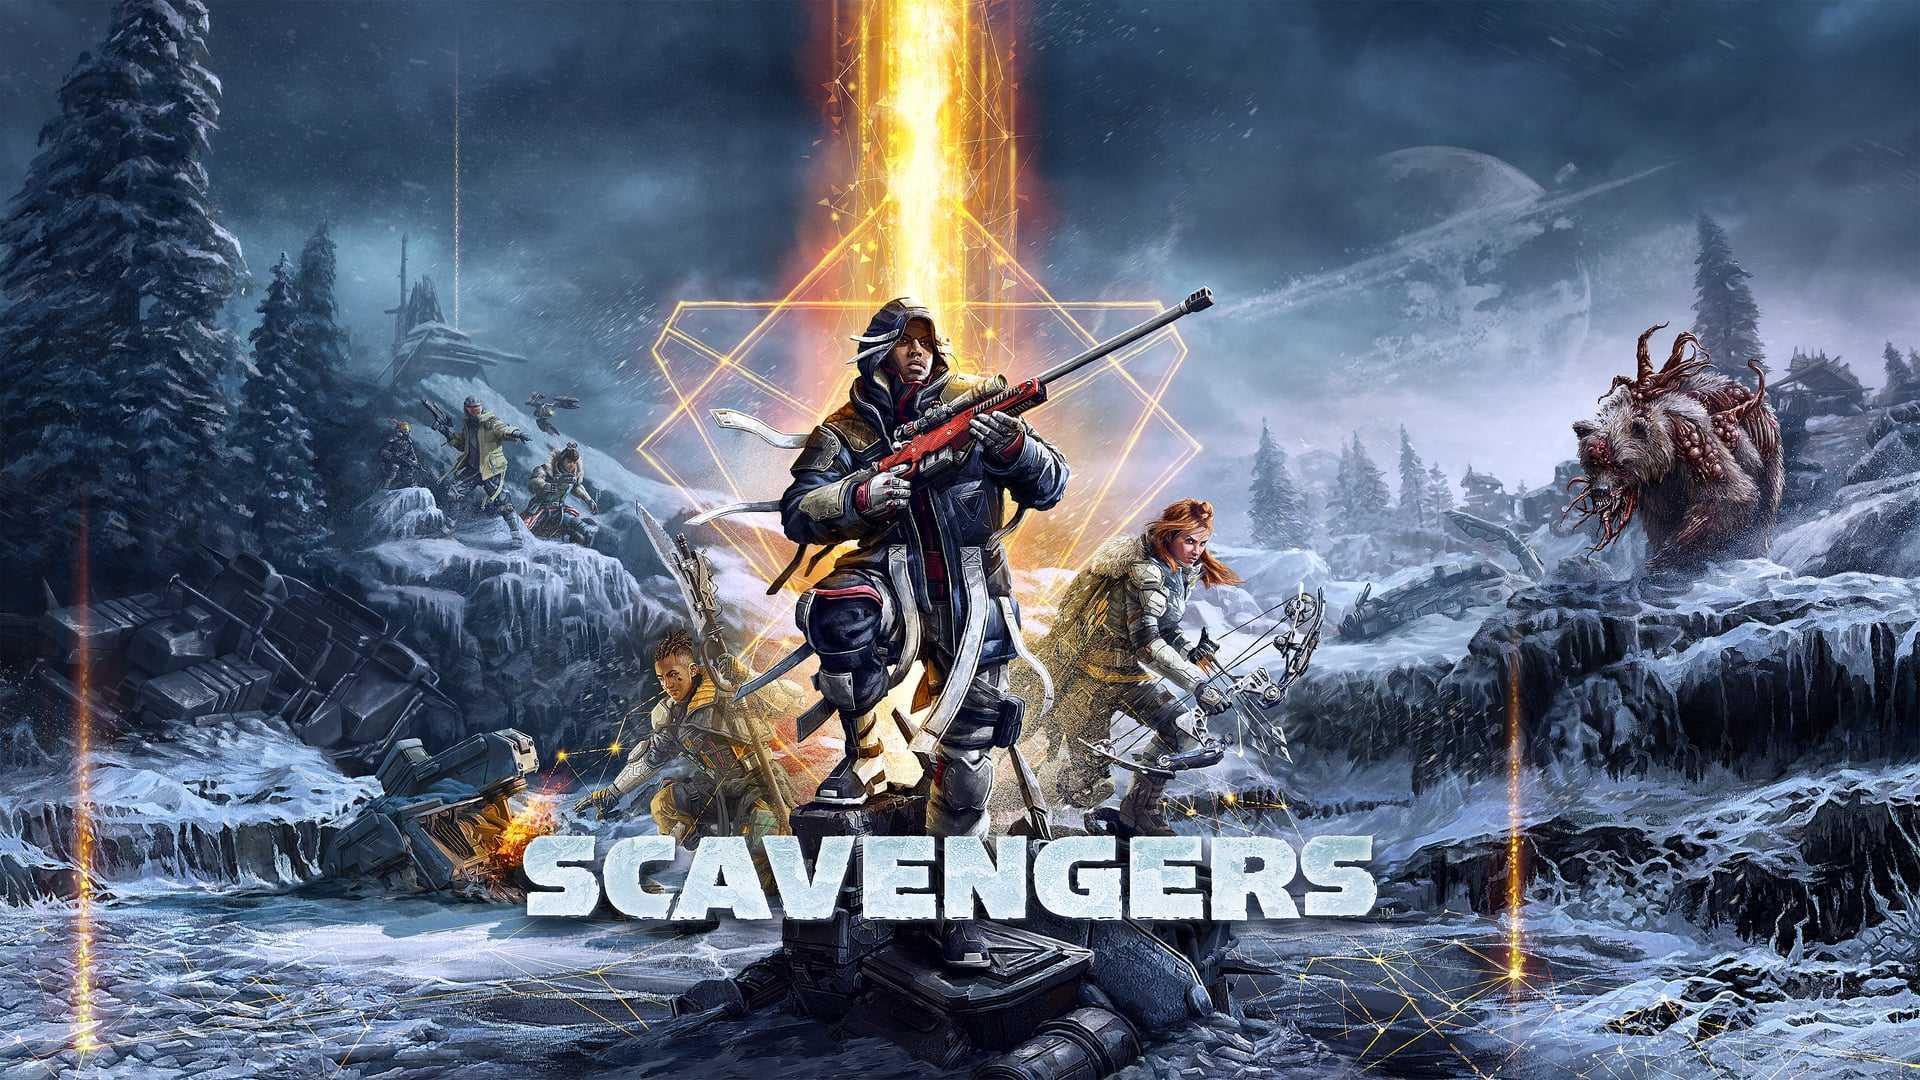 Scavengers Technical Playtesting